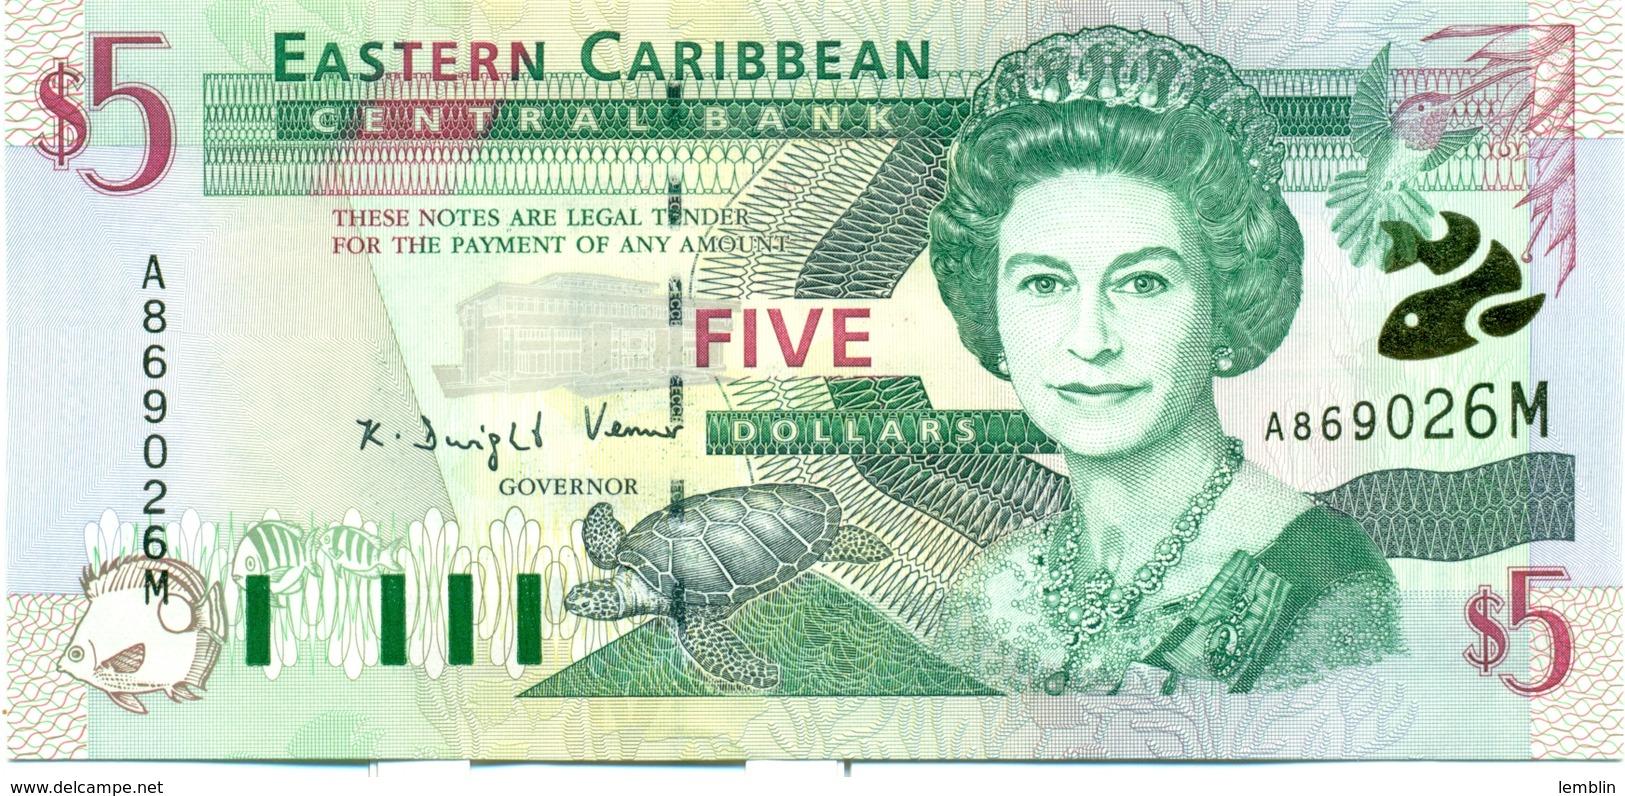 5 DOLLARS 2000 MONTSERRAT - Caraïbes Orientales